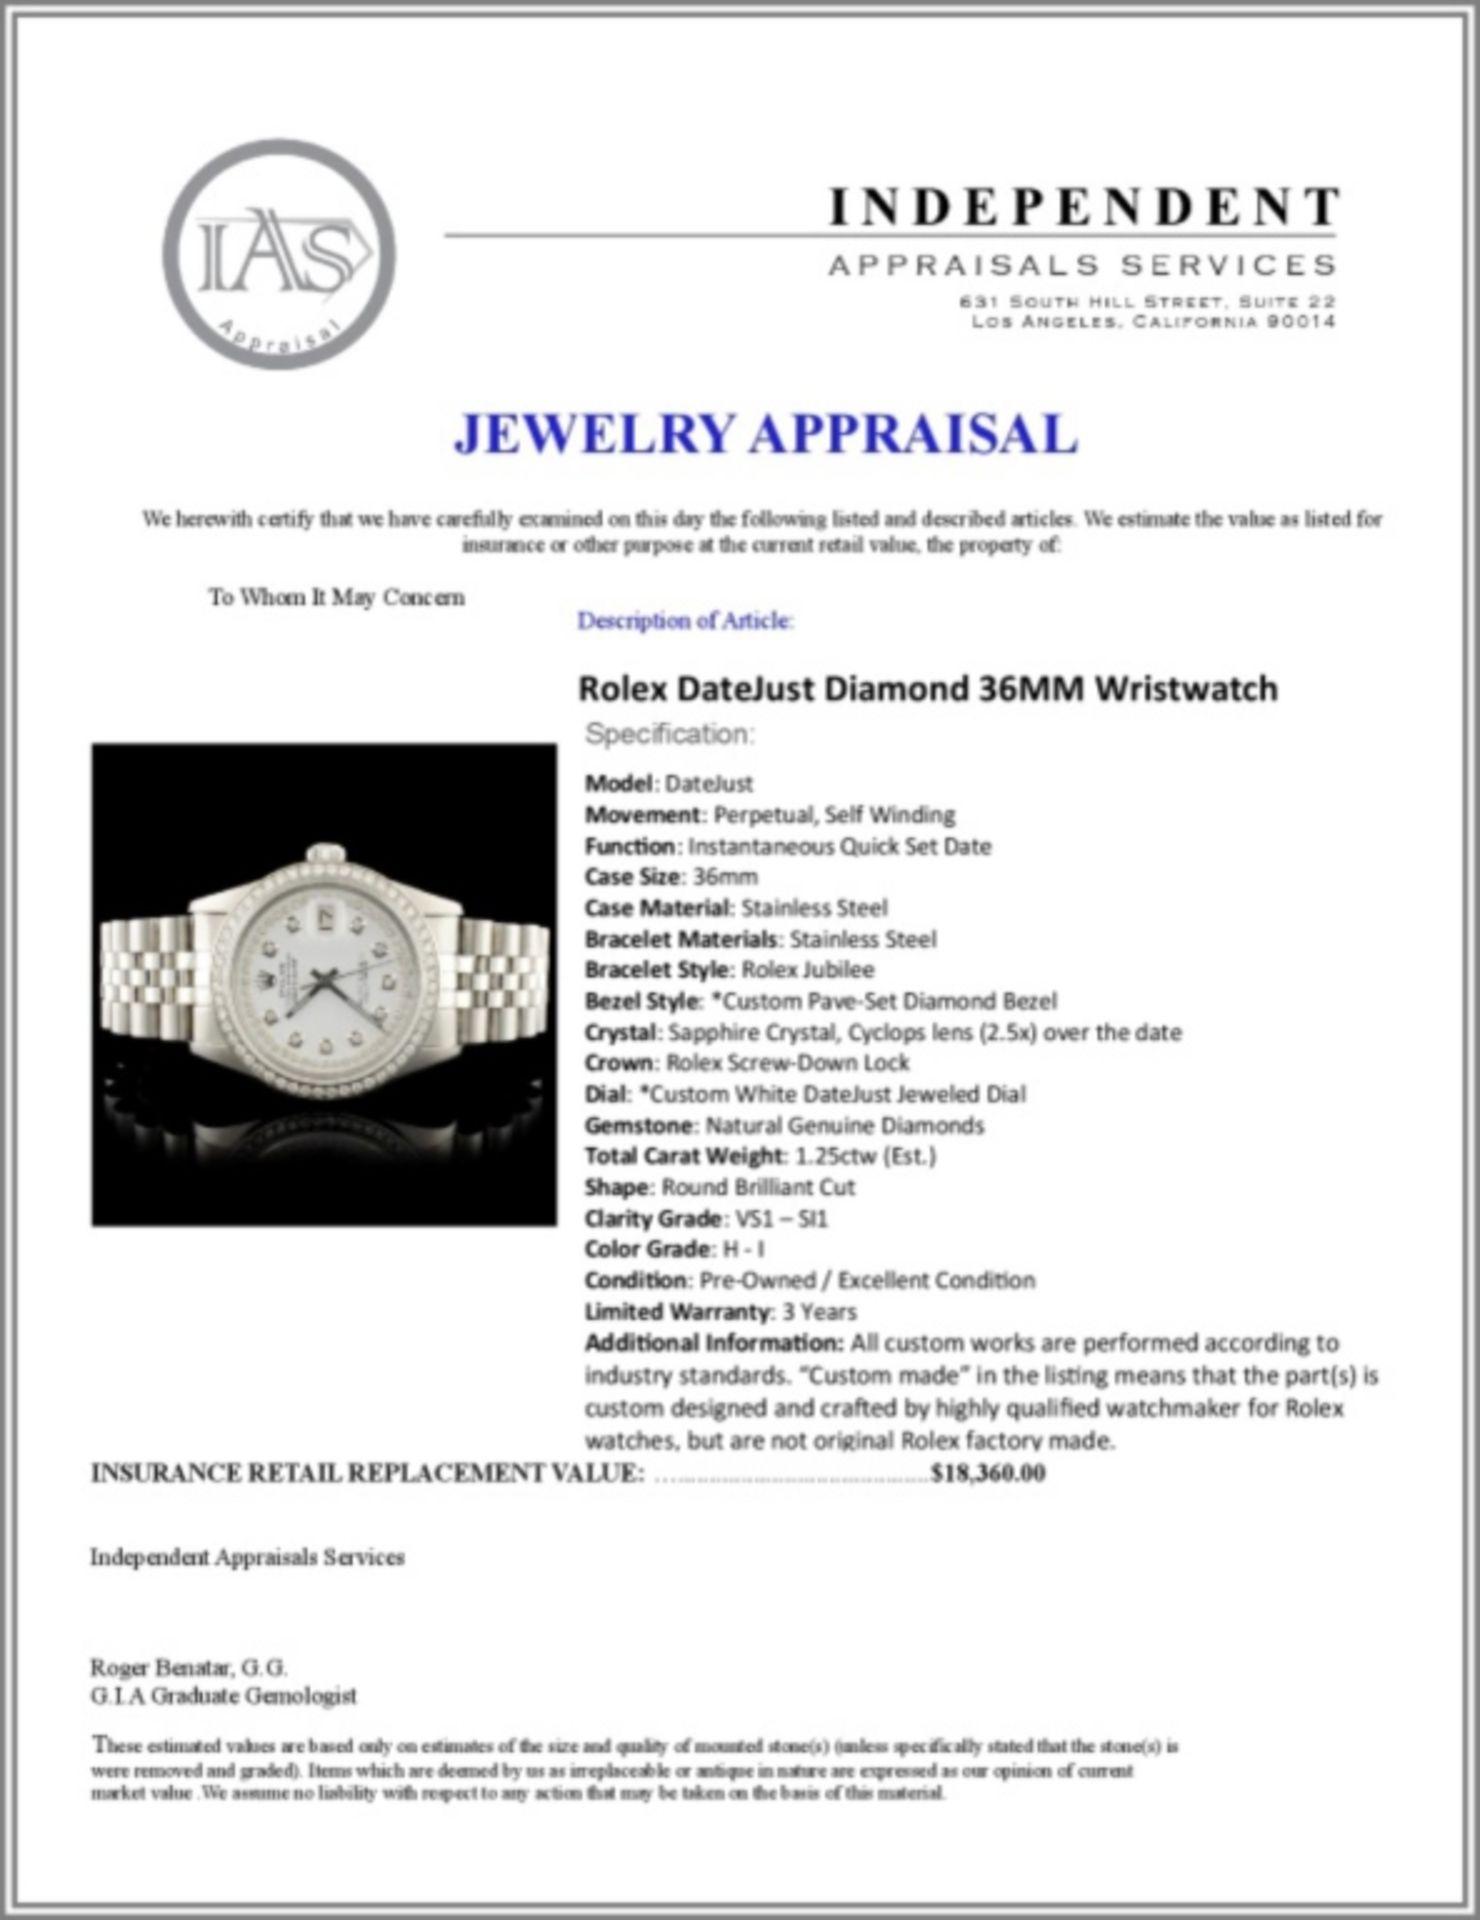 Rolex DateJust Diamond 36MM Wristwatch - Image 7 of 7